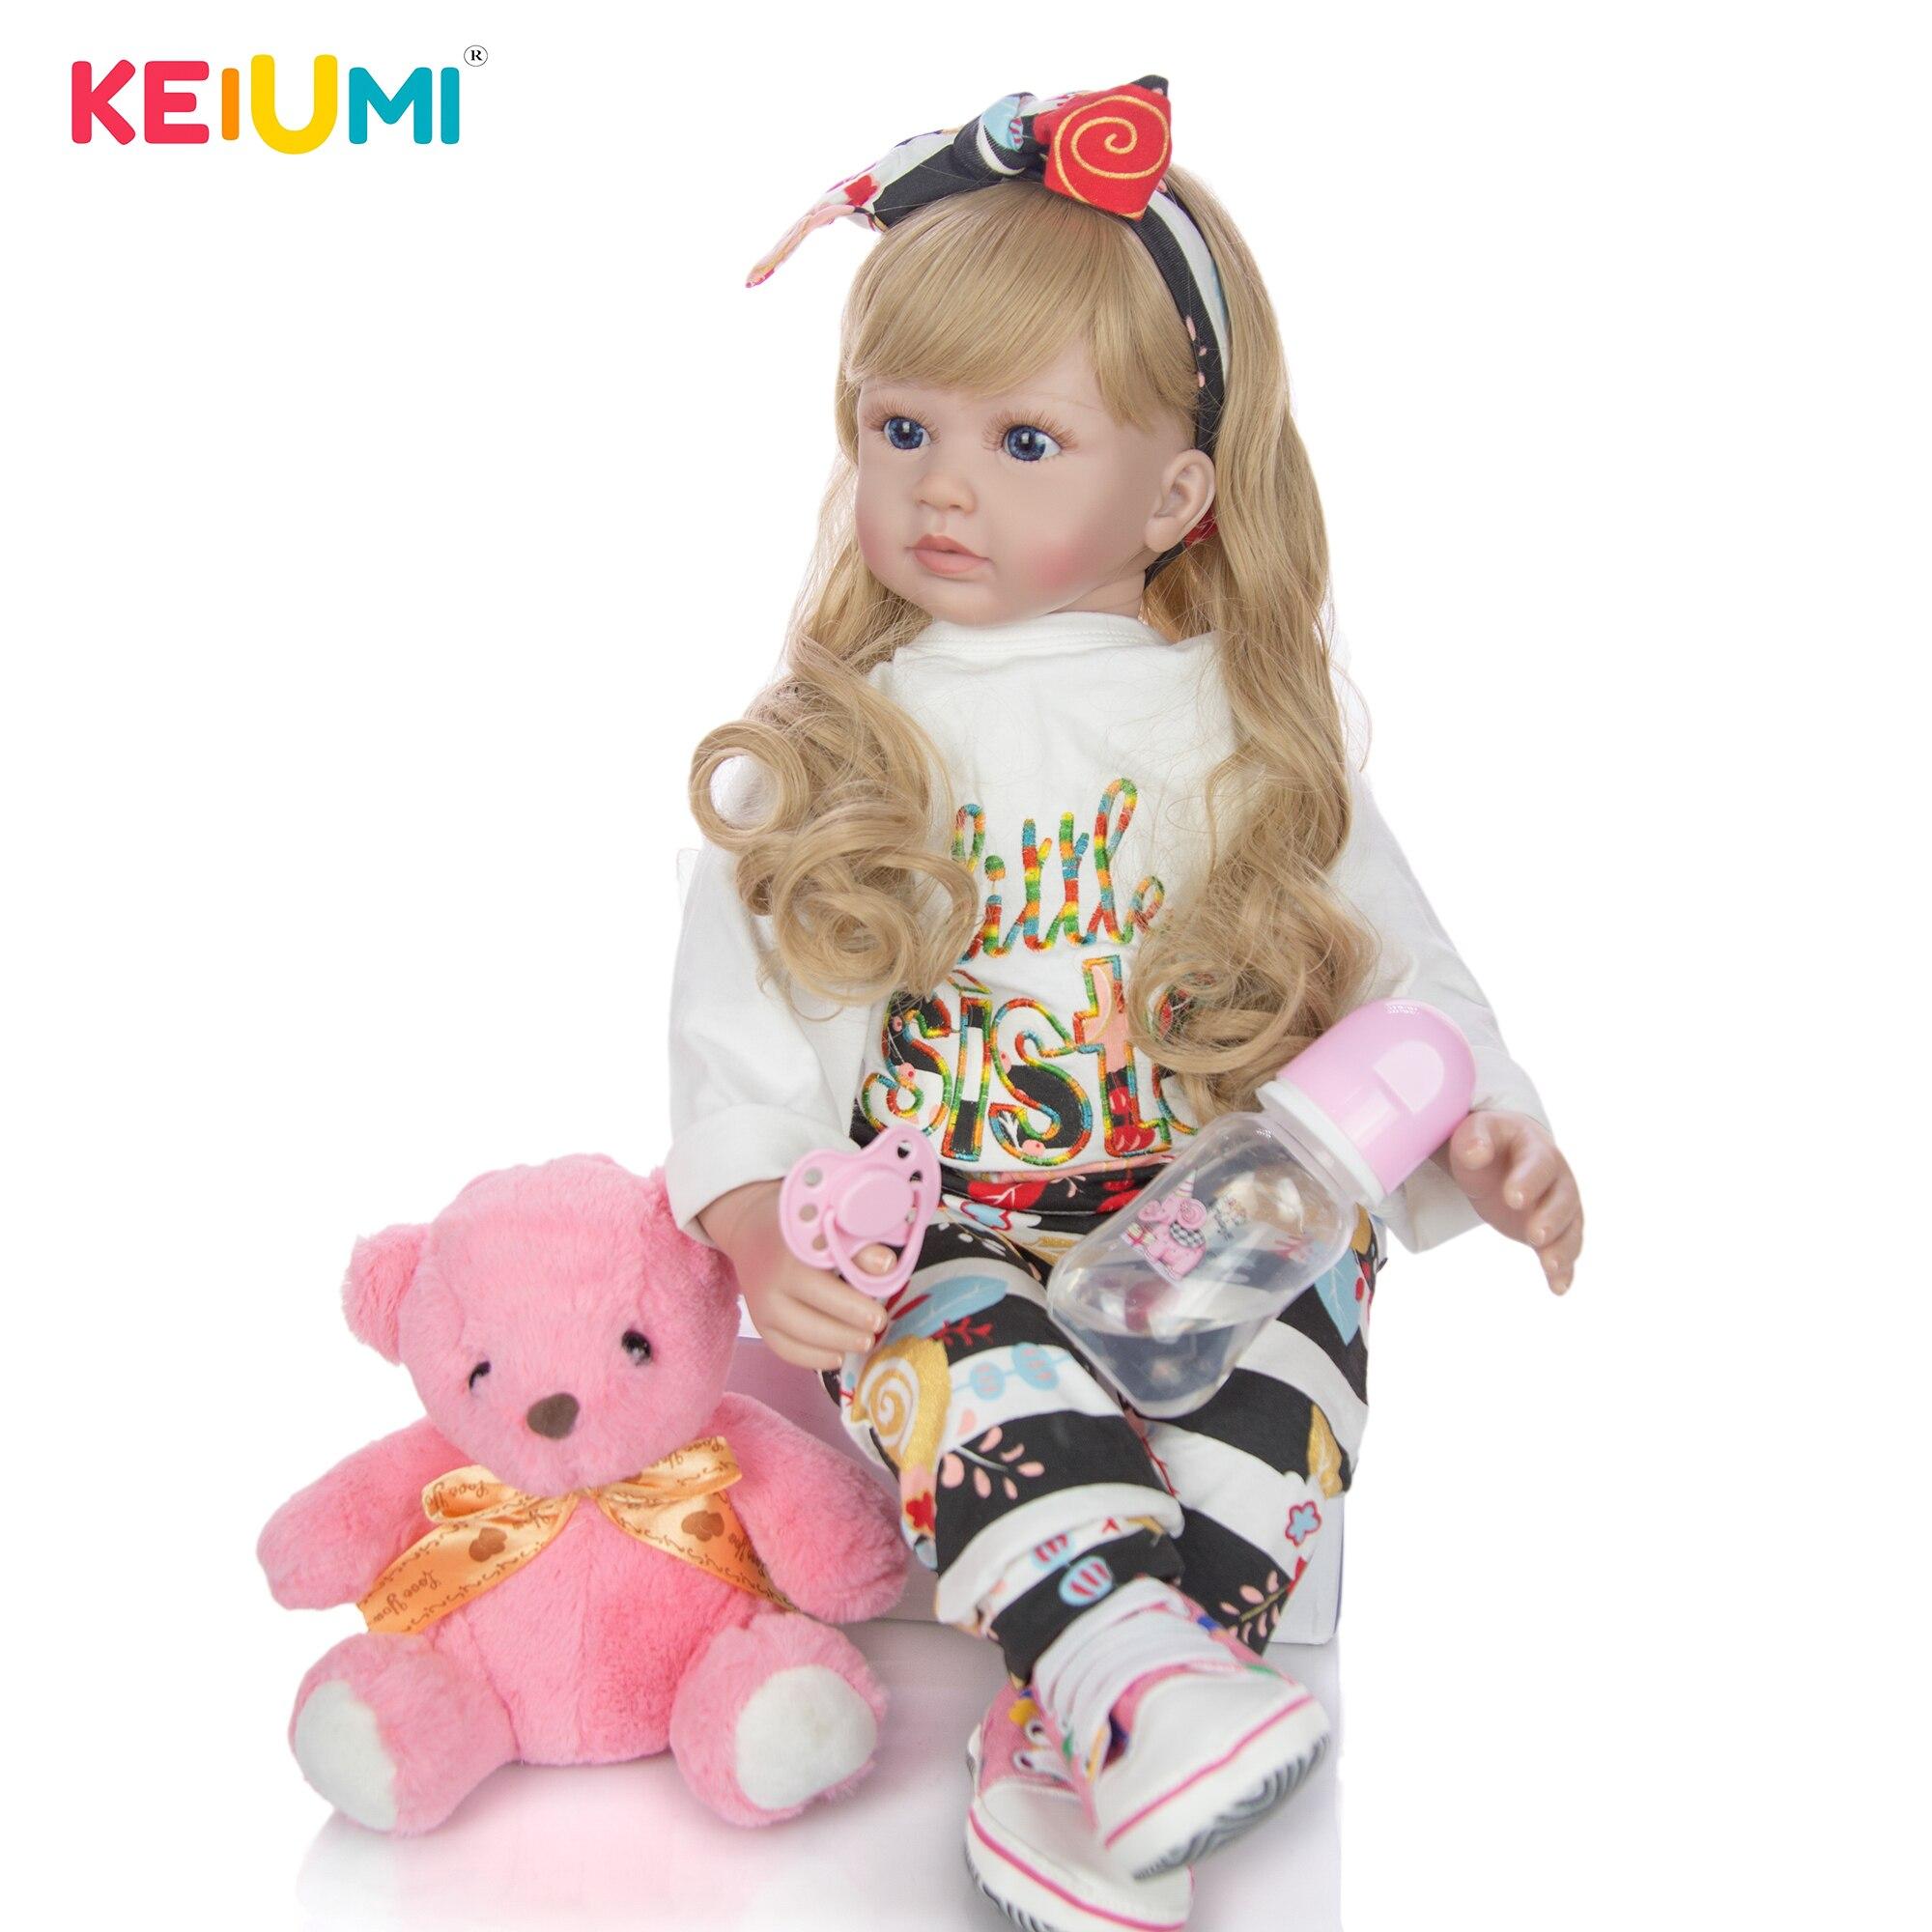 60 cm Silicone Soft Vinyl Reborn Baby Doll Lifelike Princess Doll With Blond Hair Girls Brinquedos Birthday Gift Play Doll Toys